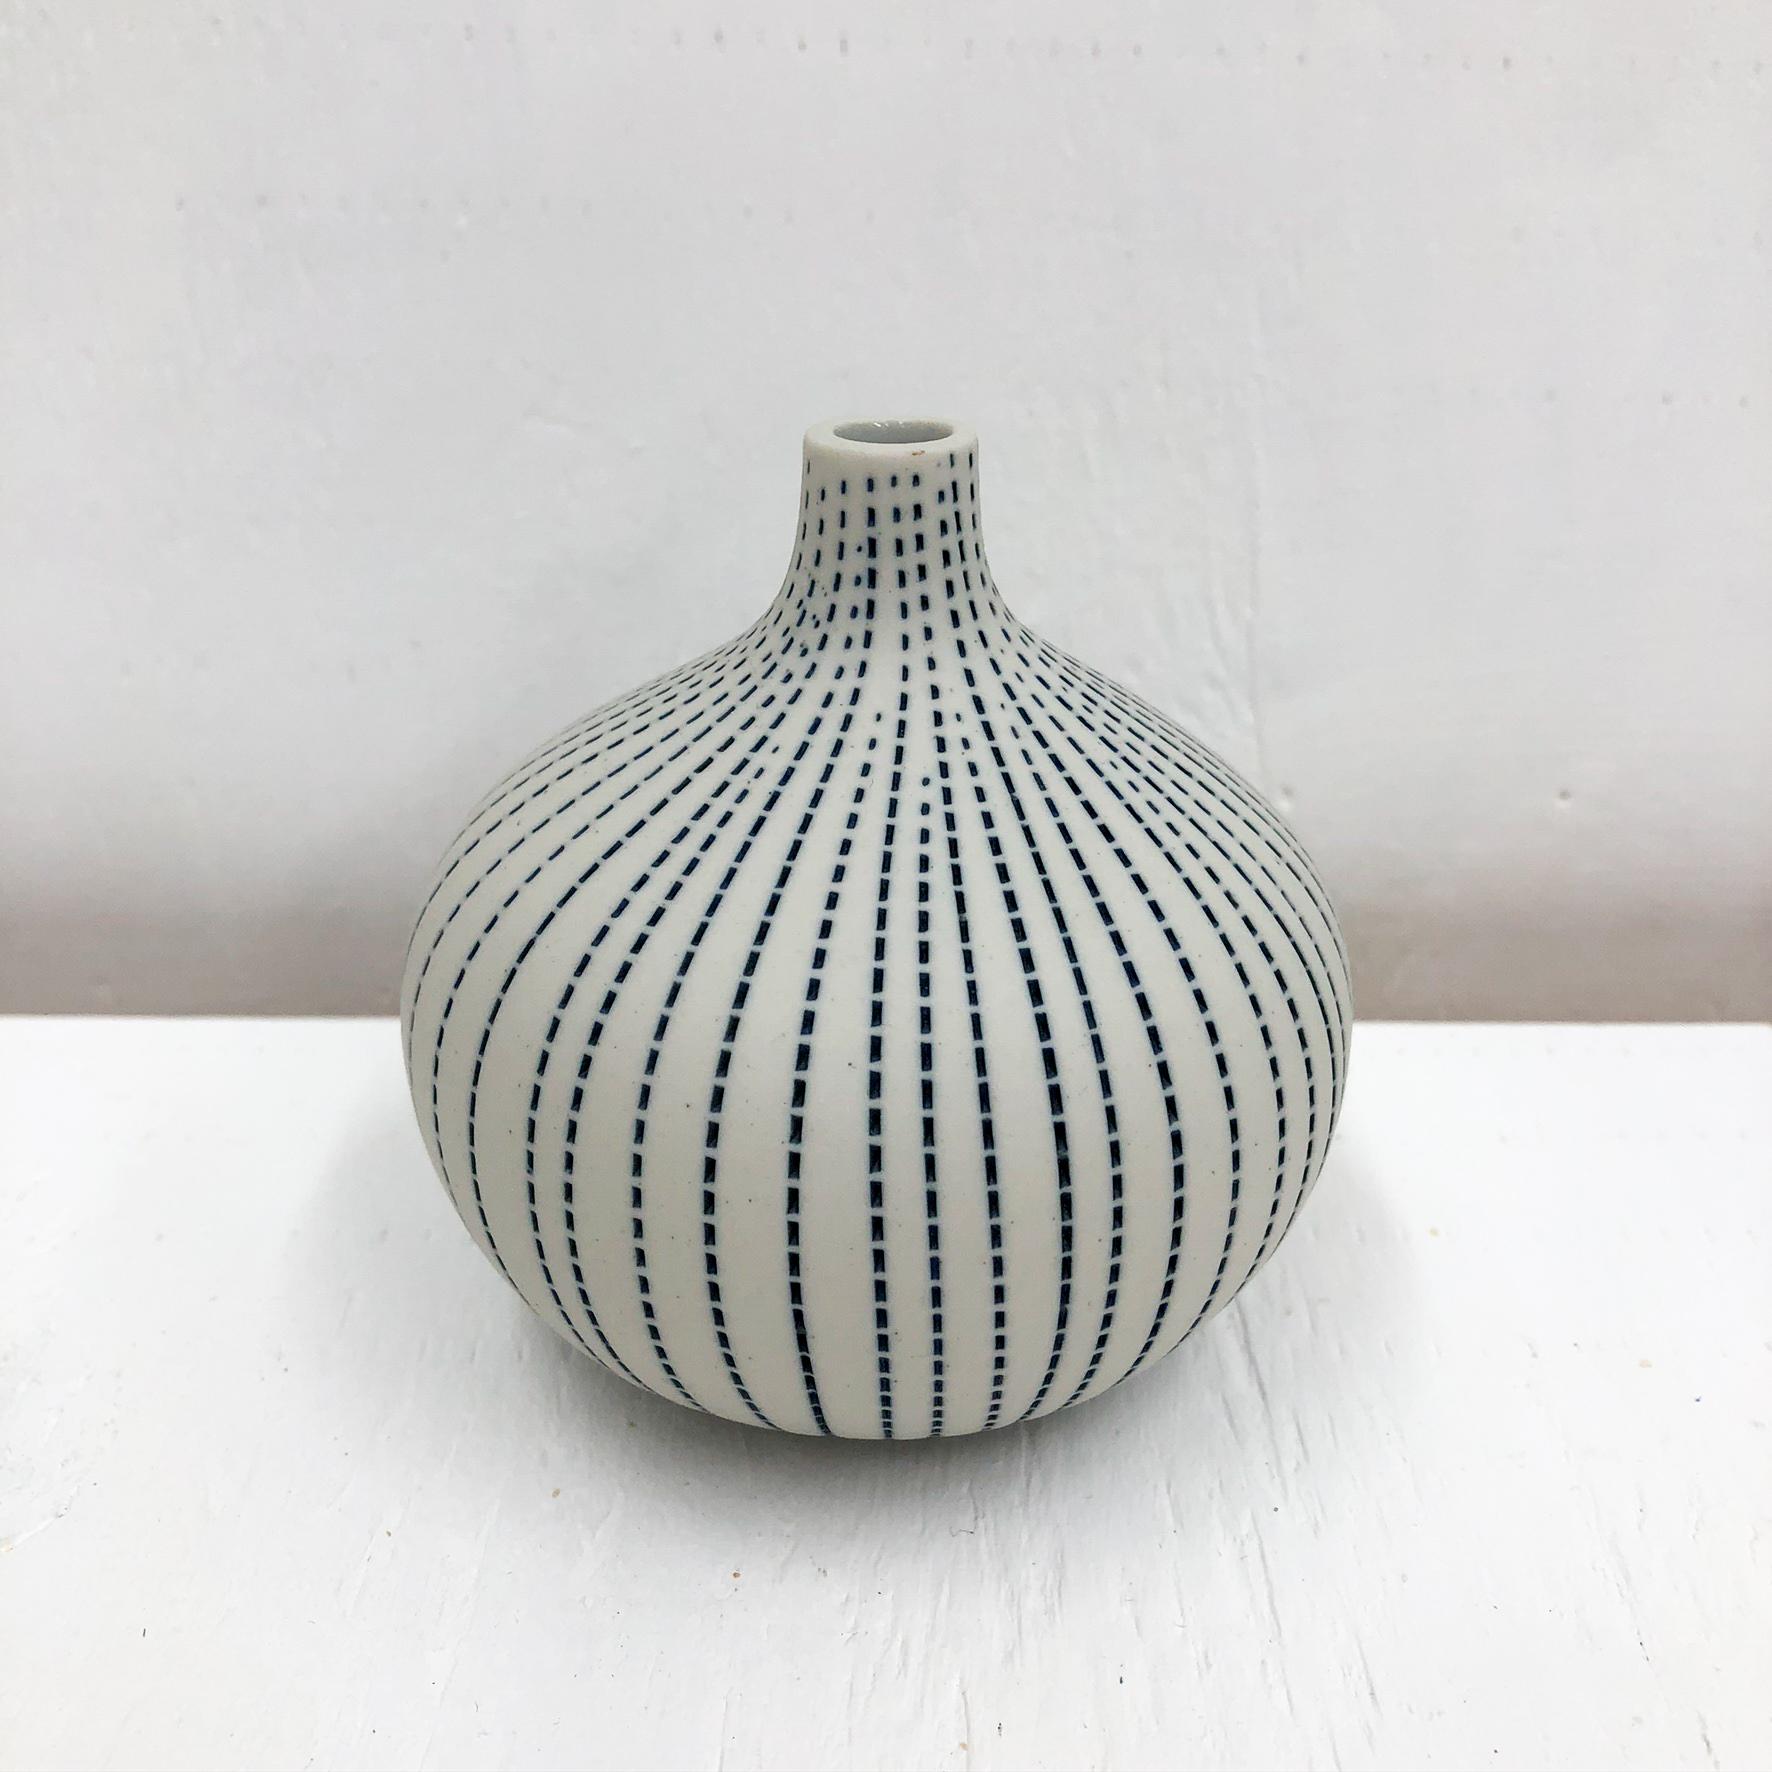 Congo Tiny L Handmade Vase